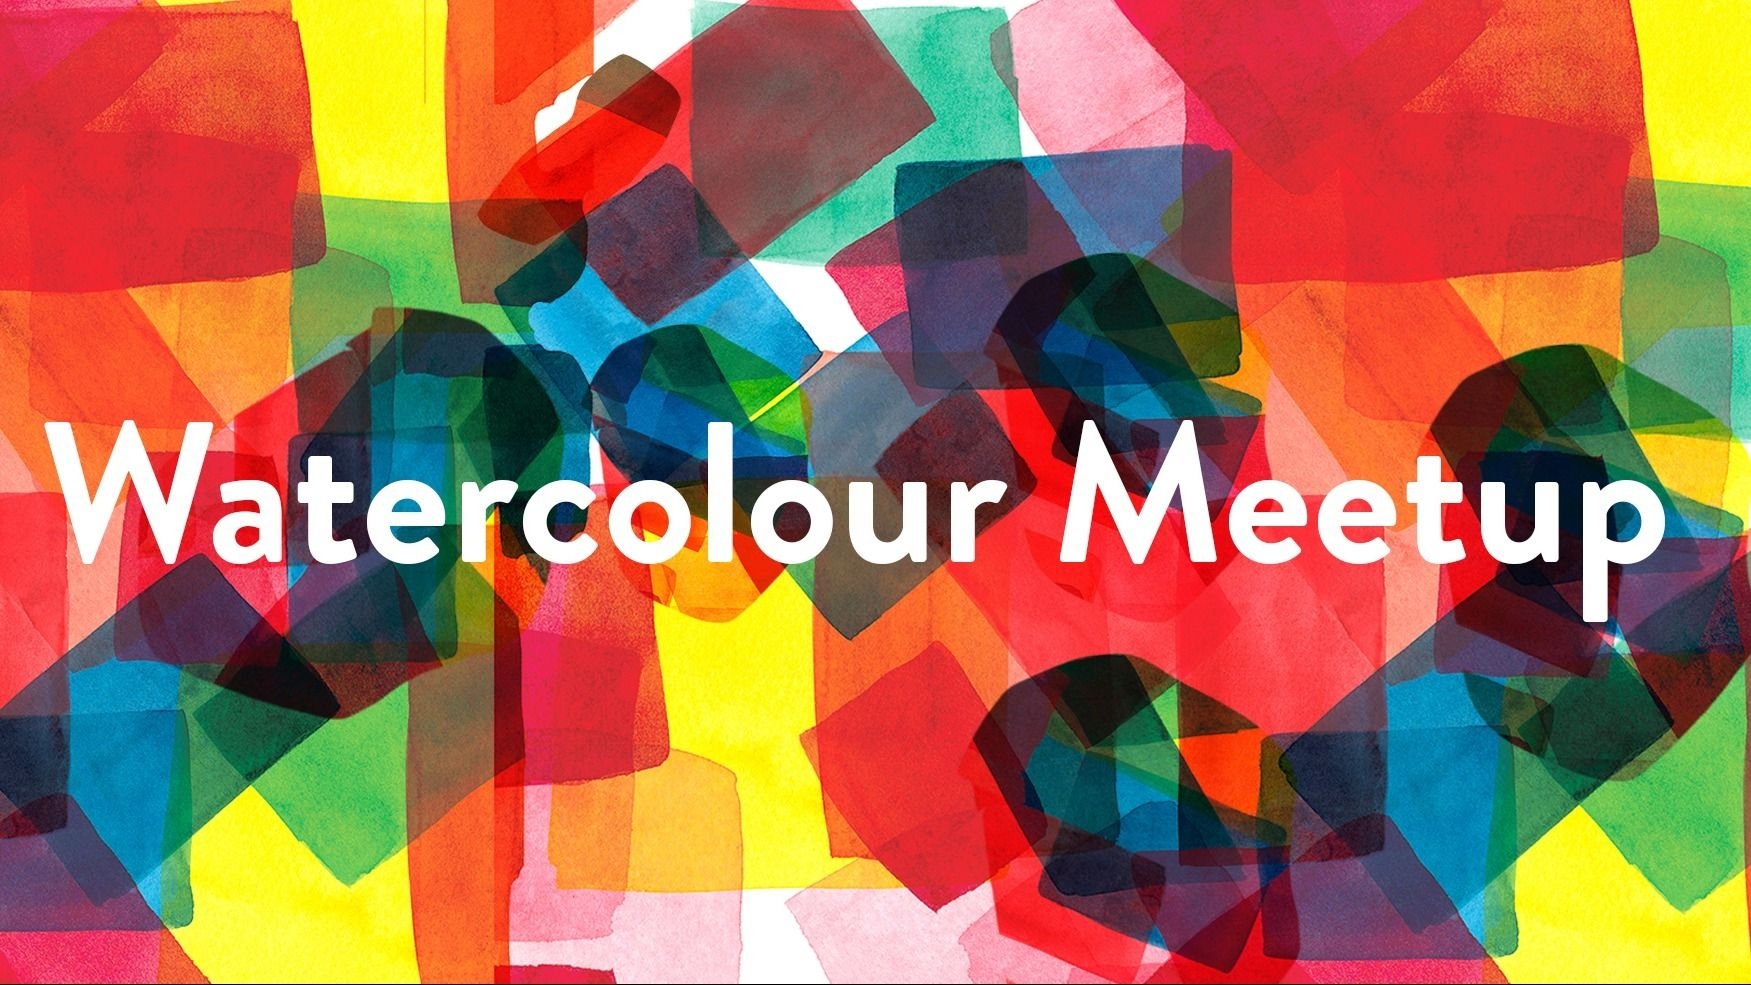 Watercolour Meetup